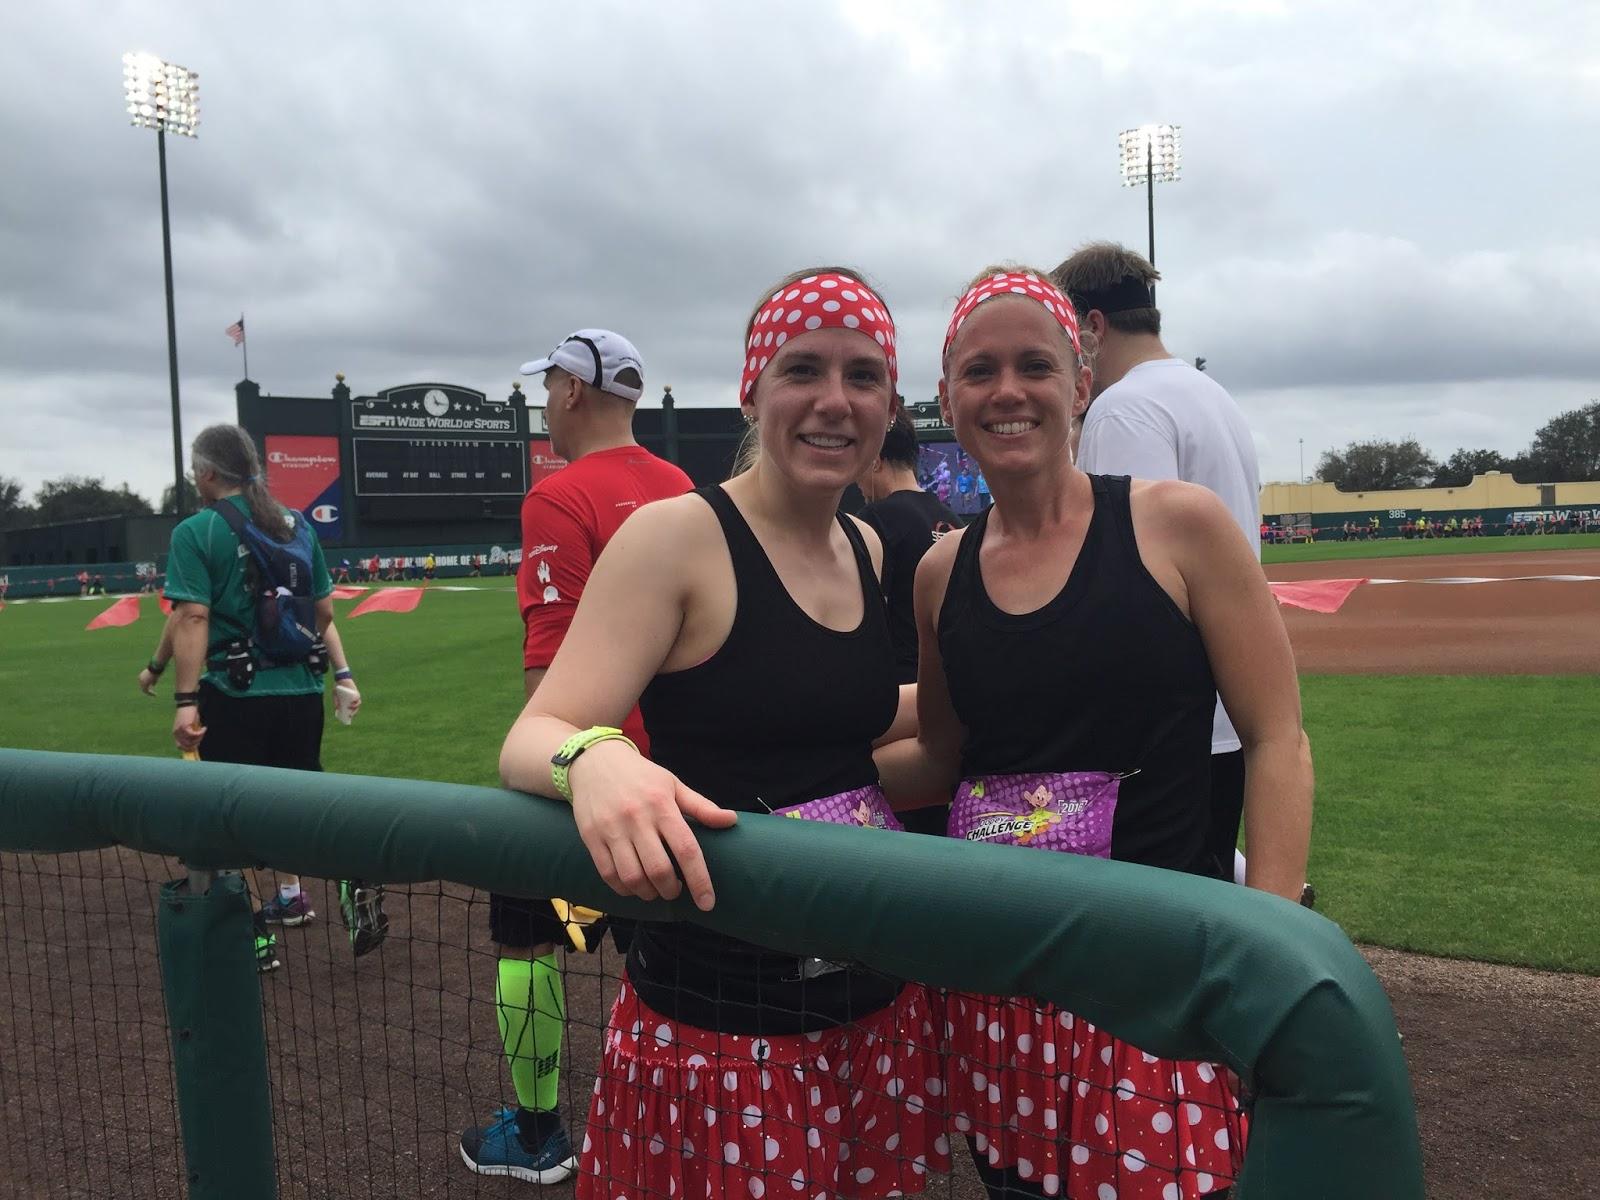 Dopey Challenge Mickey Marathon 2016 Picture together before running around the baseball field at ESPN World